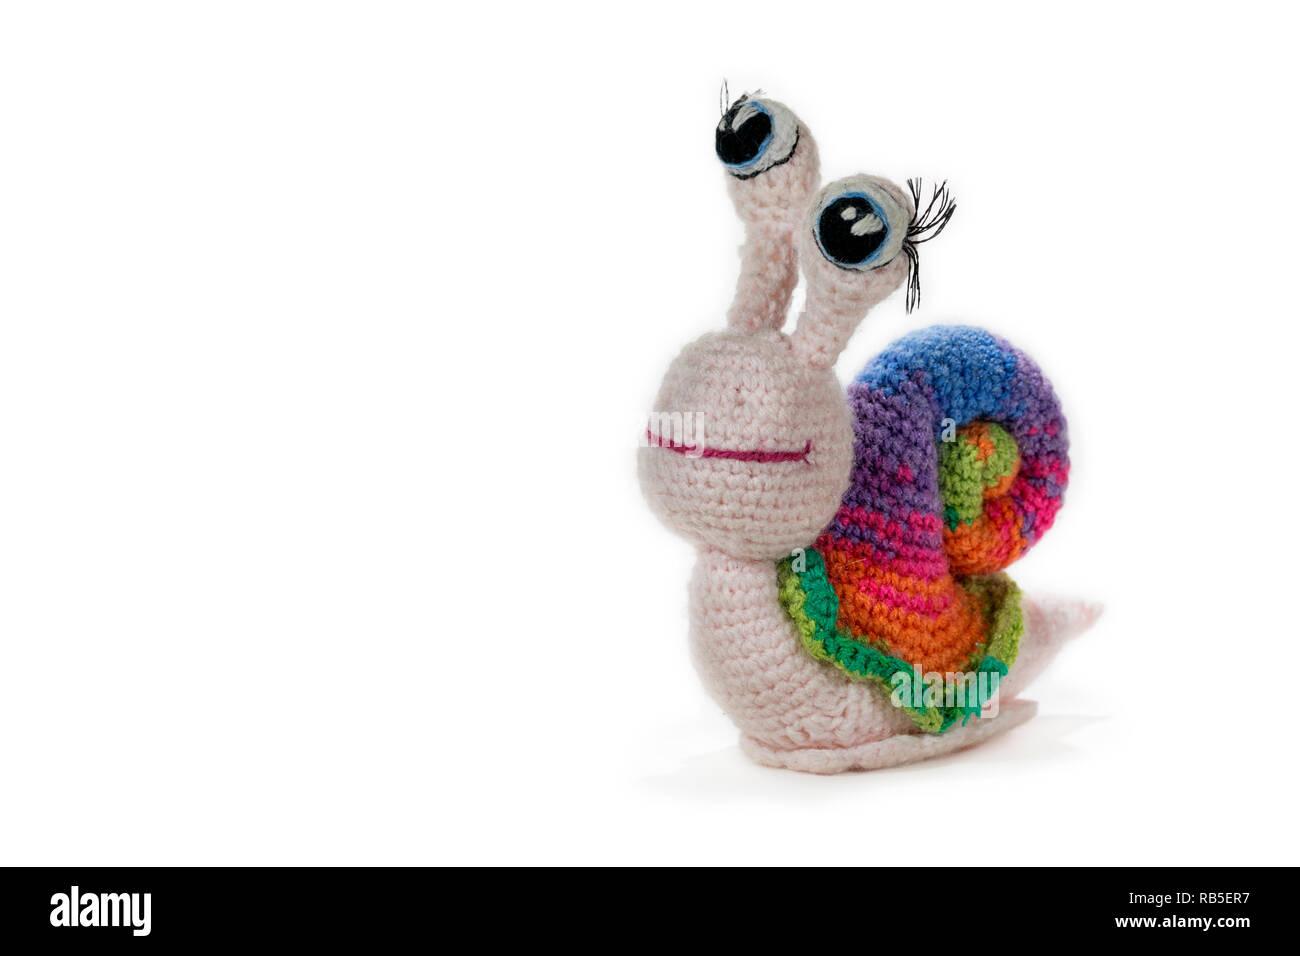 hight resolution of crochet rainbow snail with eyes on white background amigurumi handmade stock image